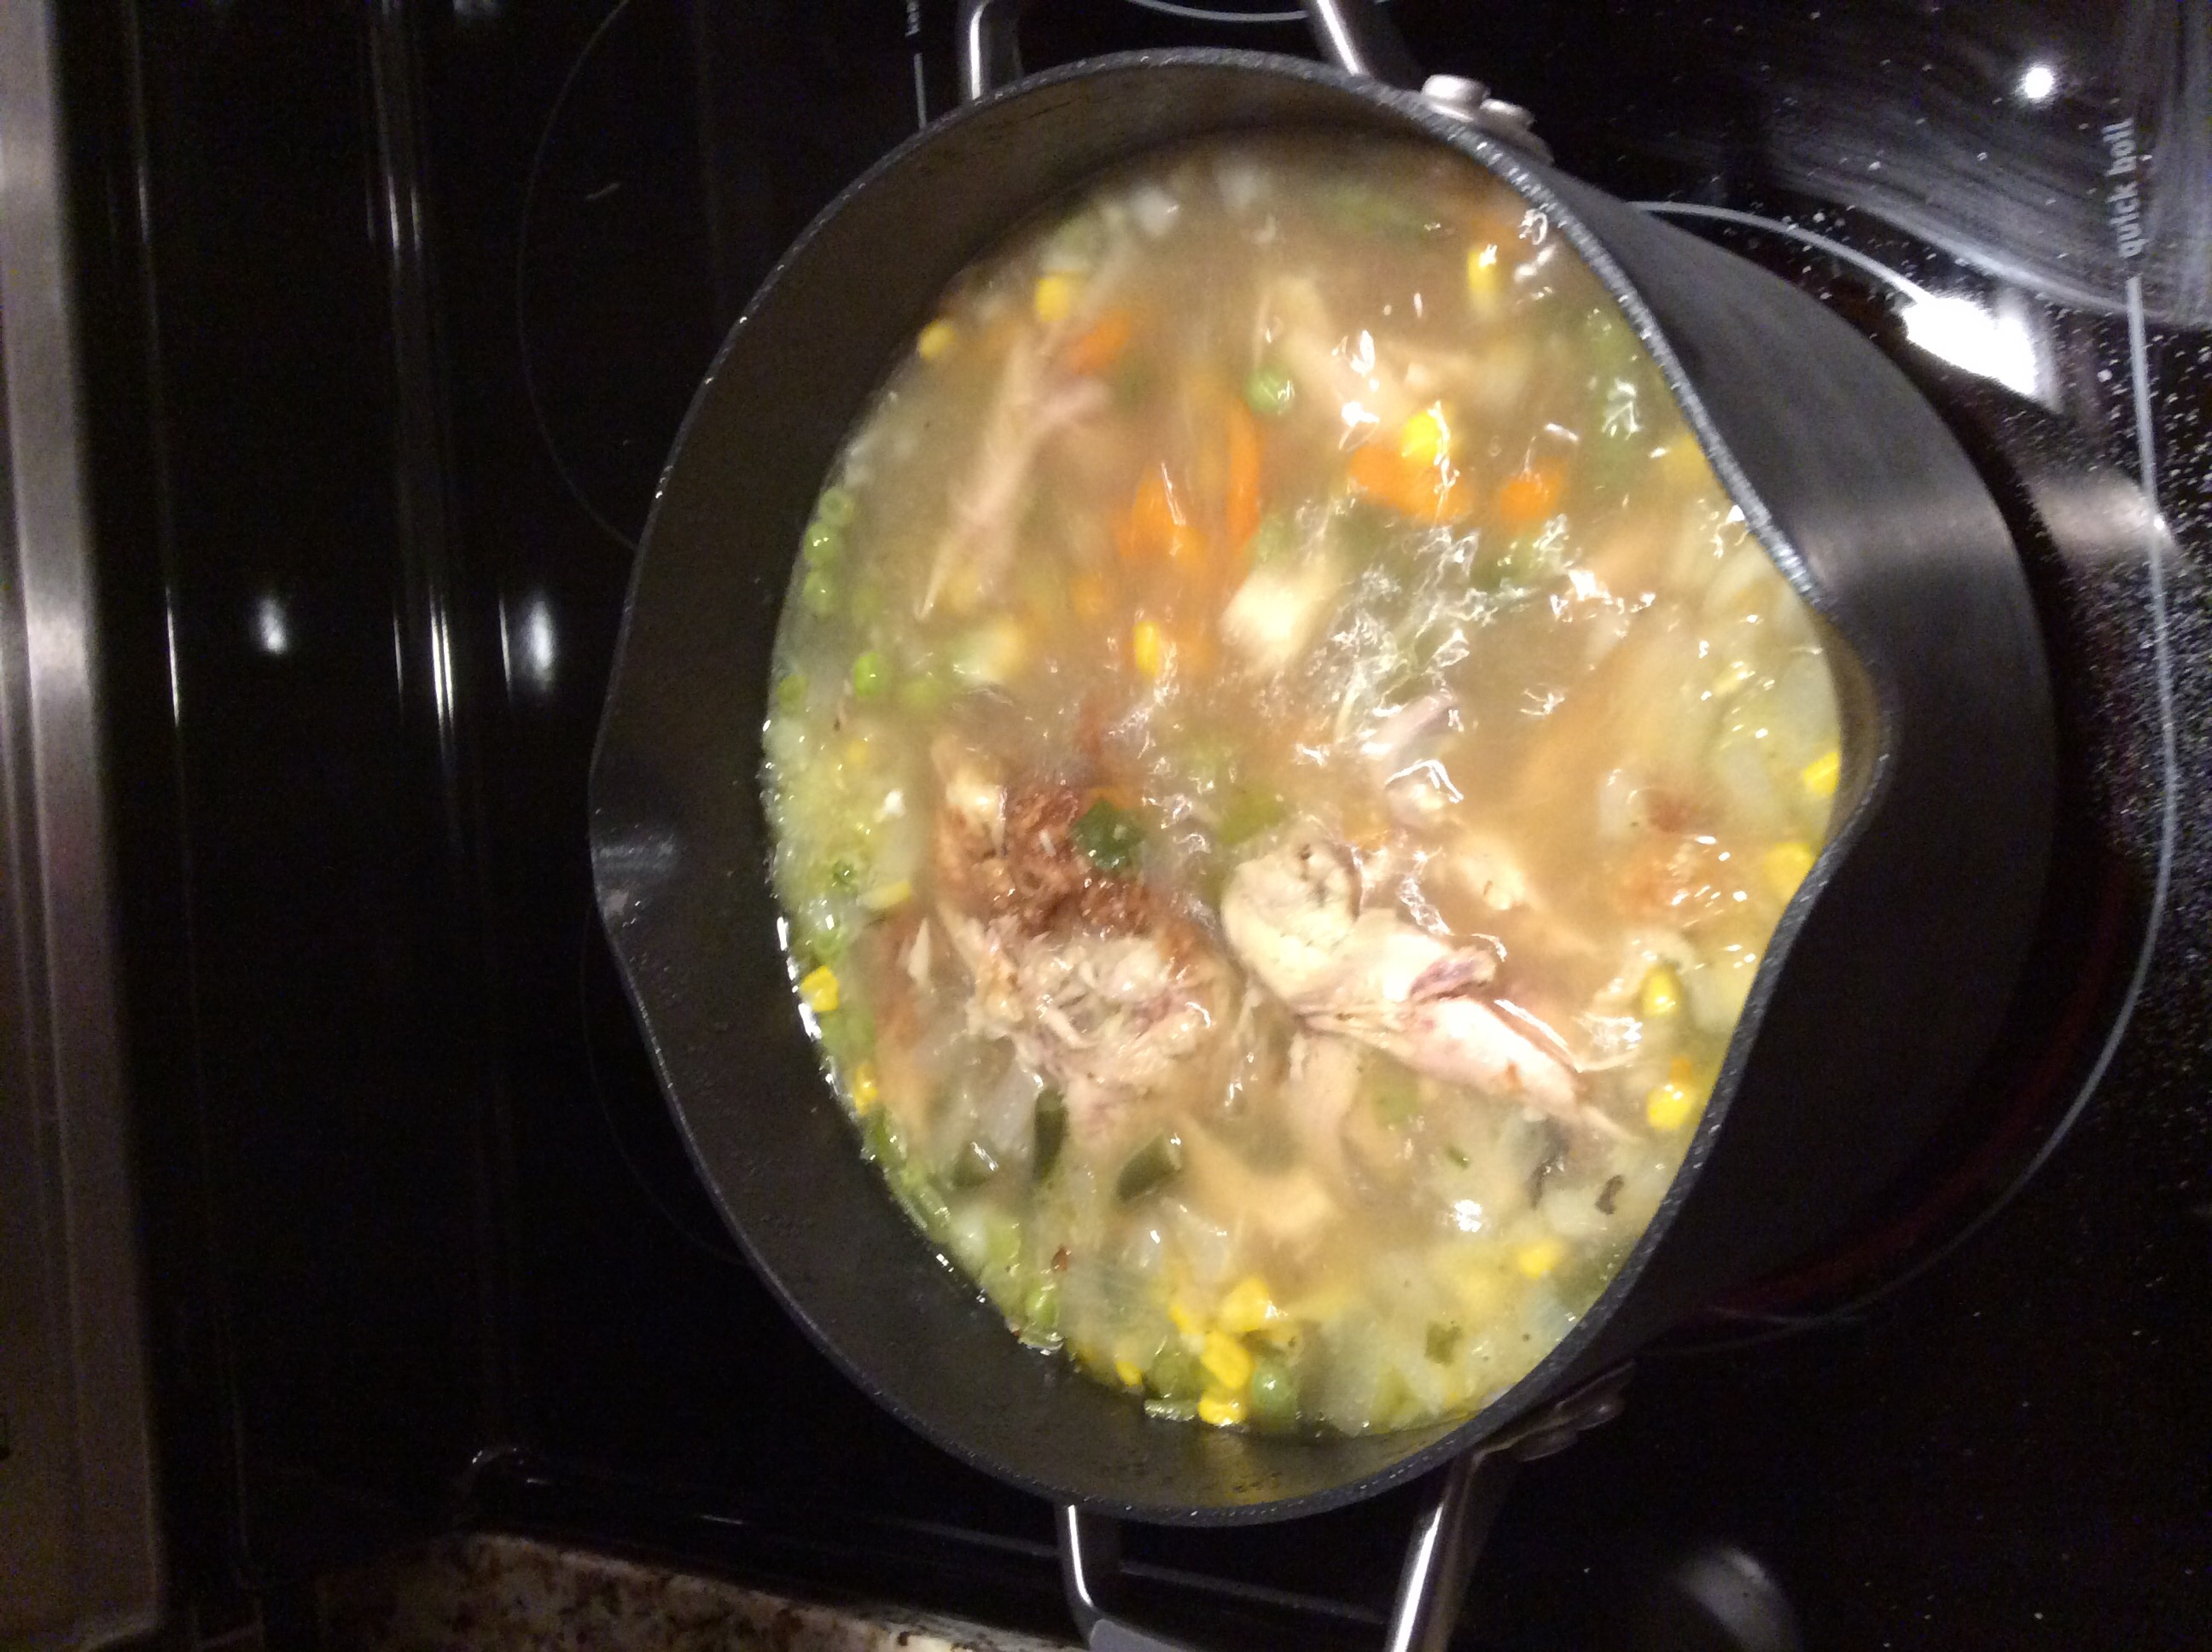 Leftover Roast Chicken Soup Linda Ribaudo-Scribner